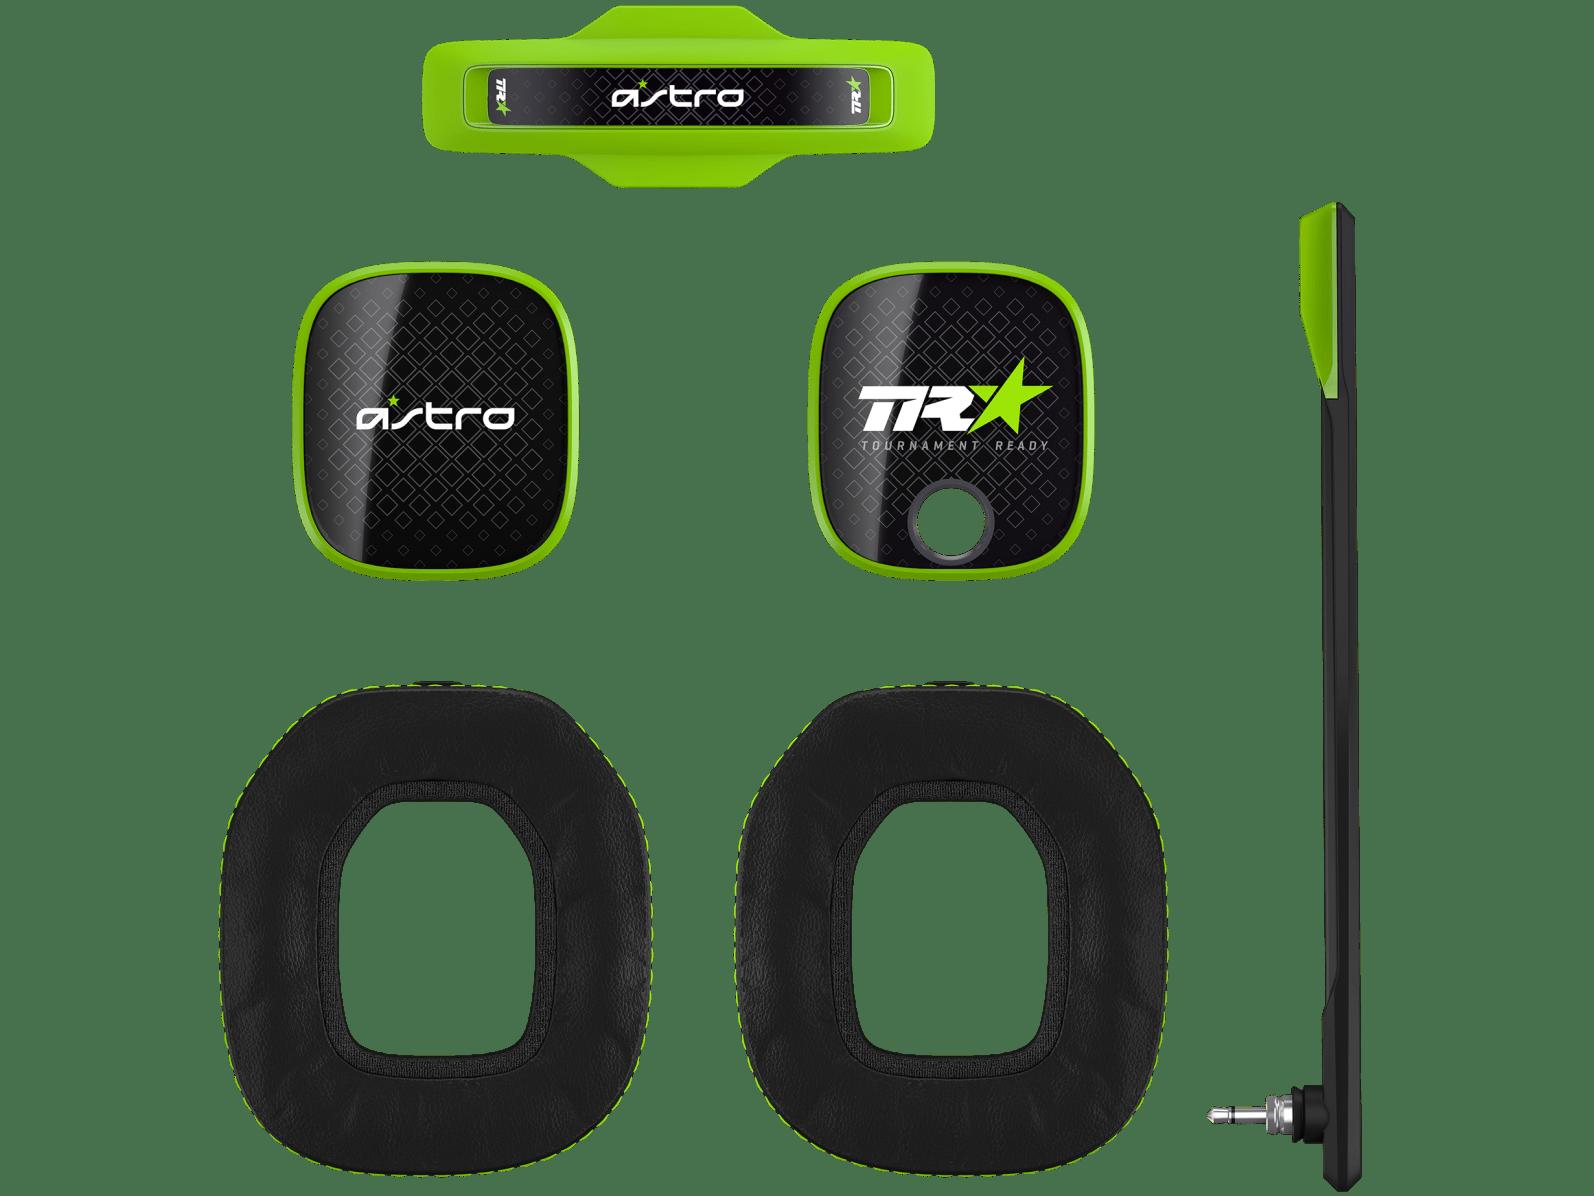 mod-kit-gallery-green-01